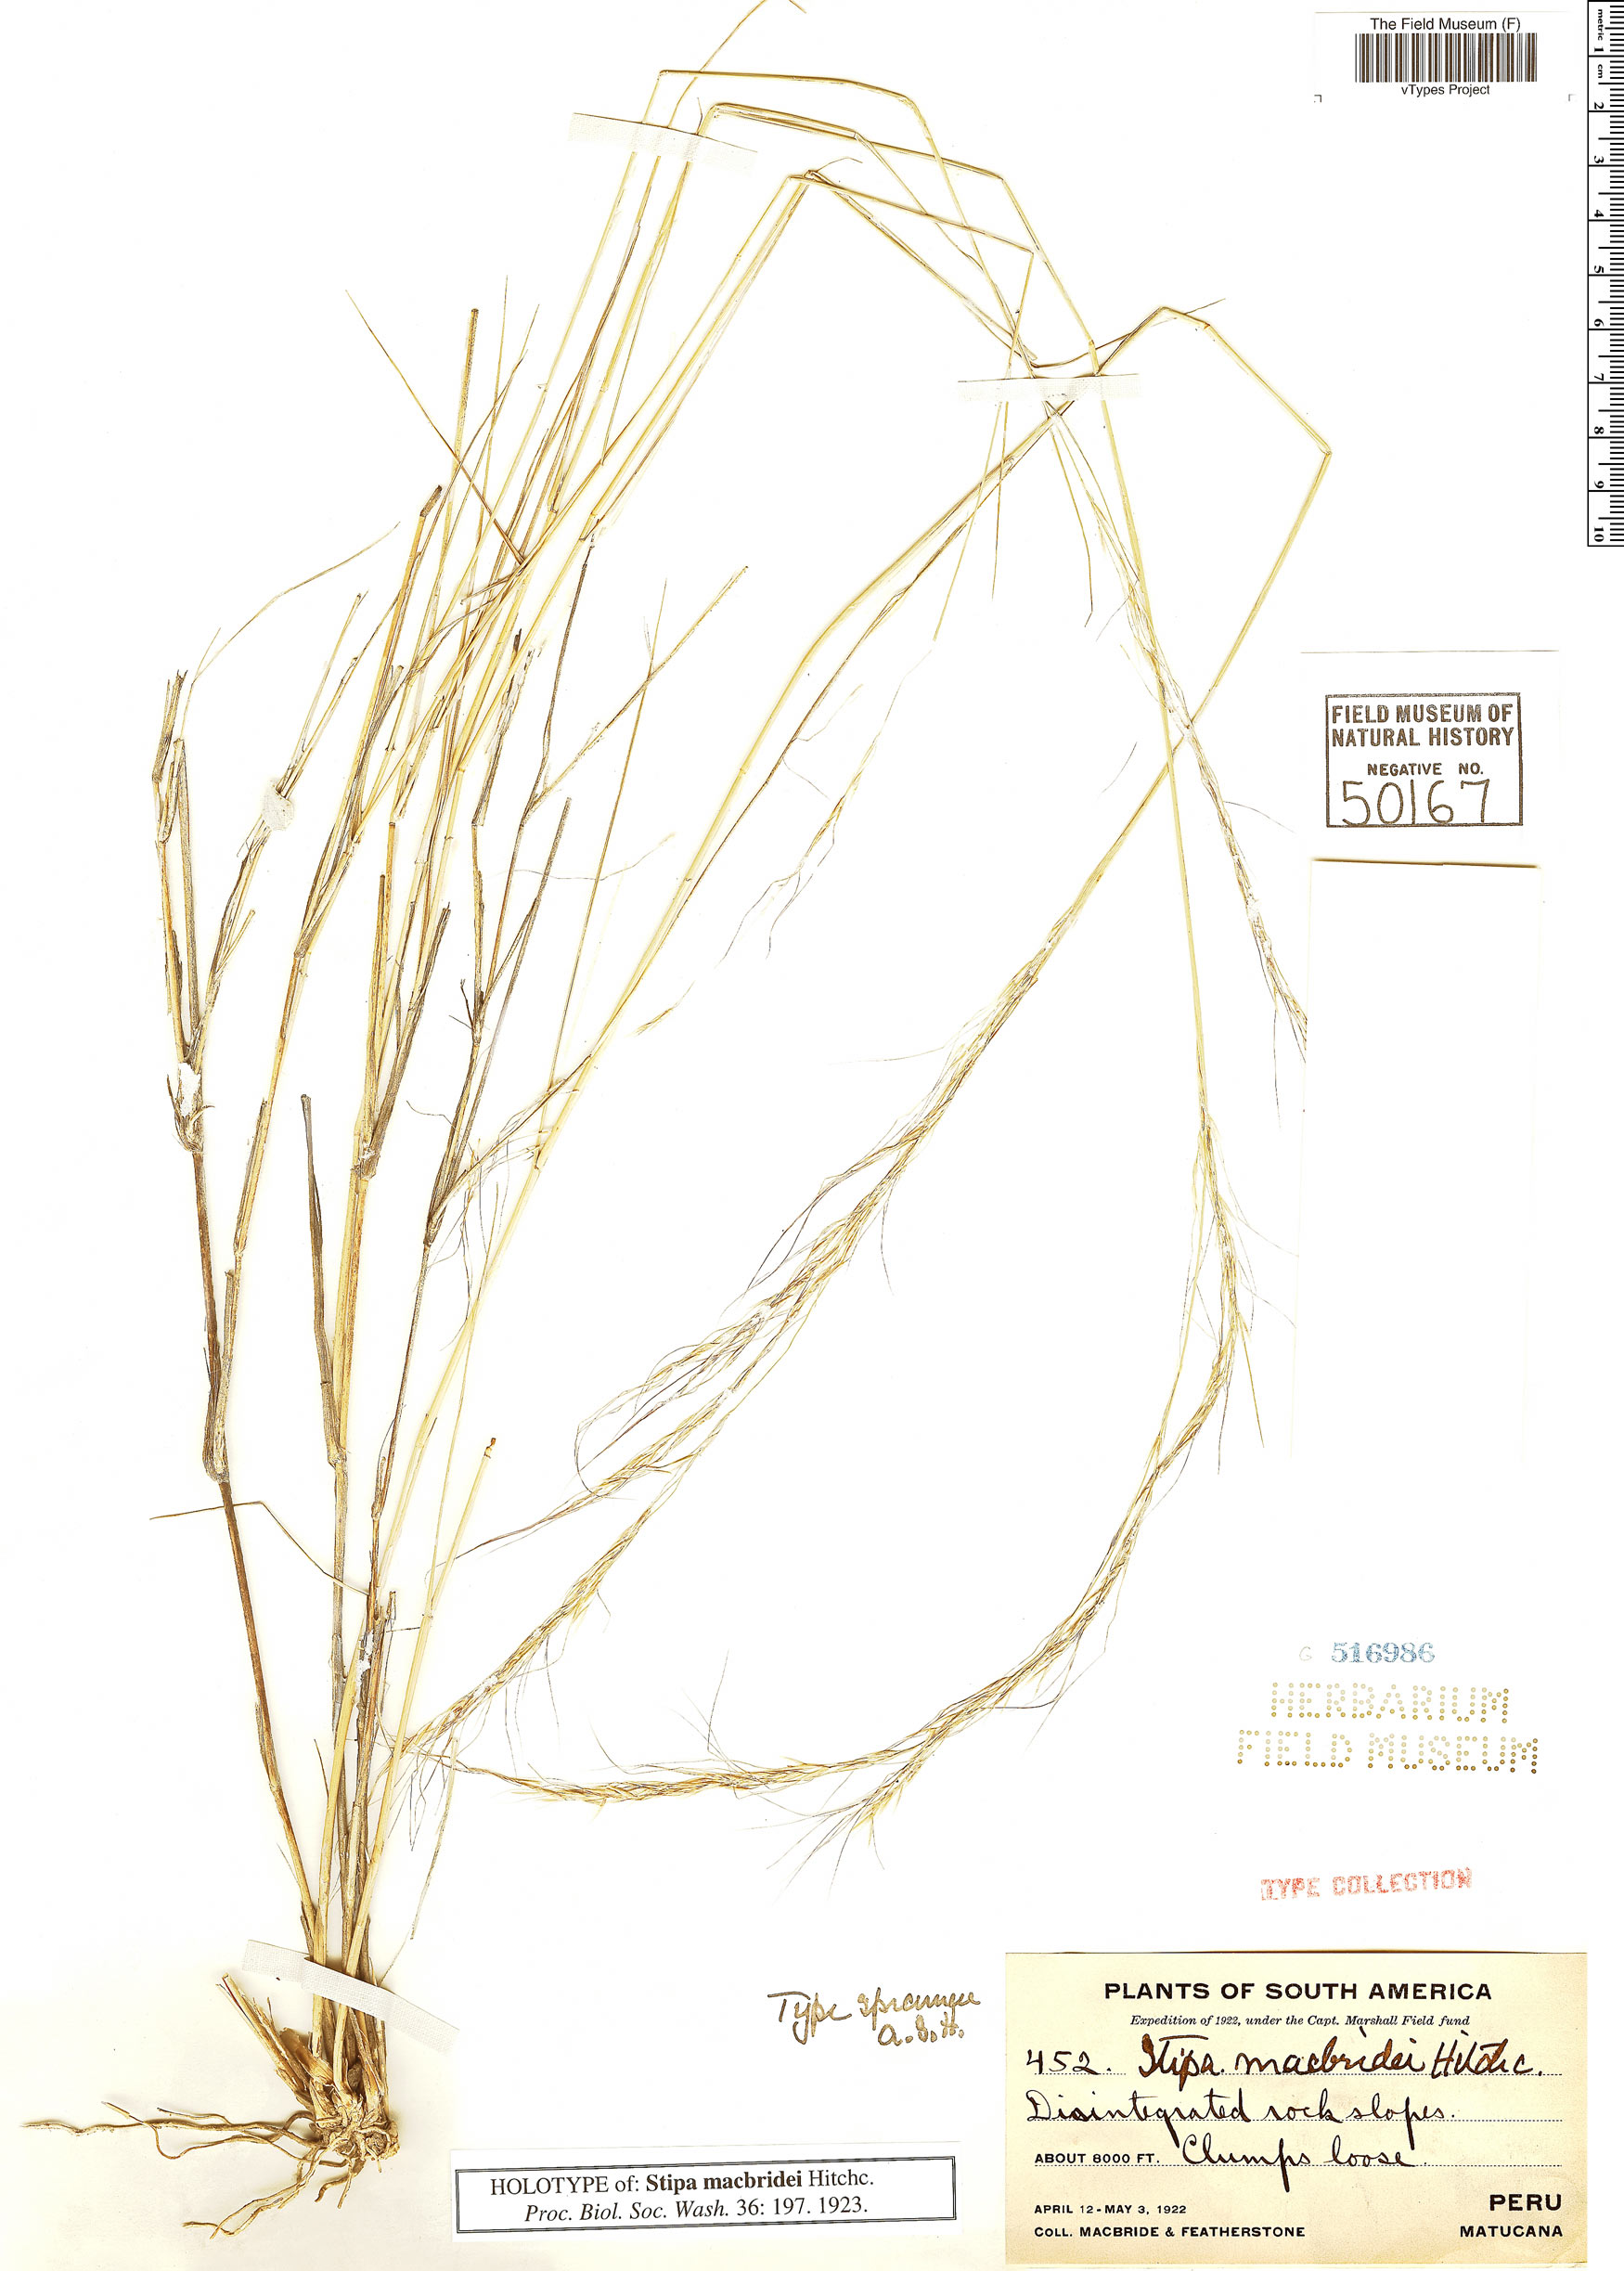 Specimen: Jarava macbridei